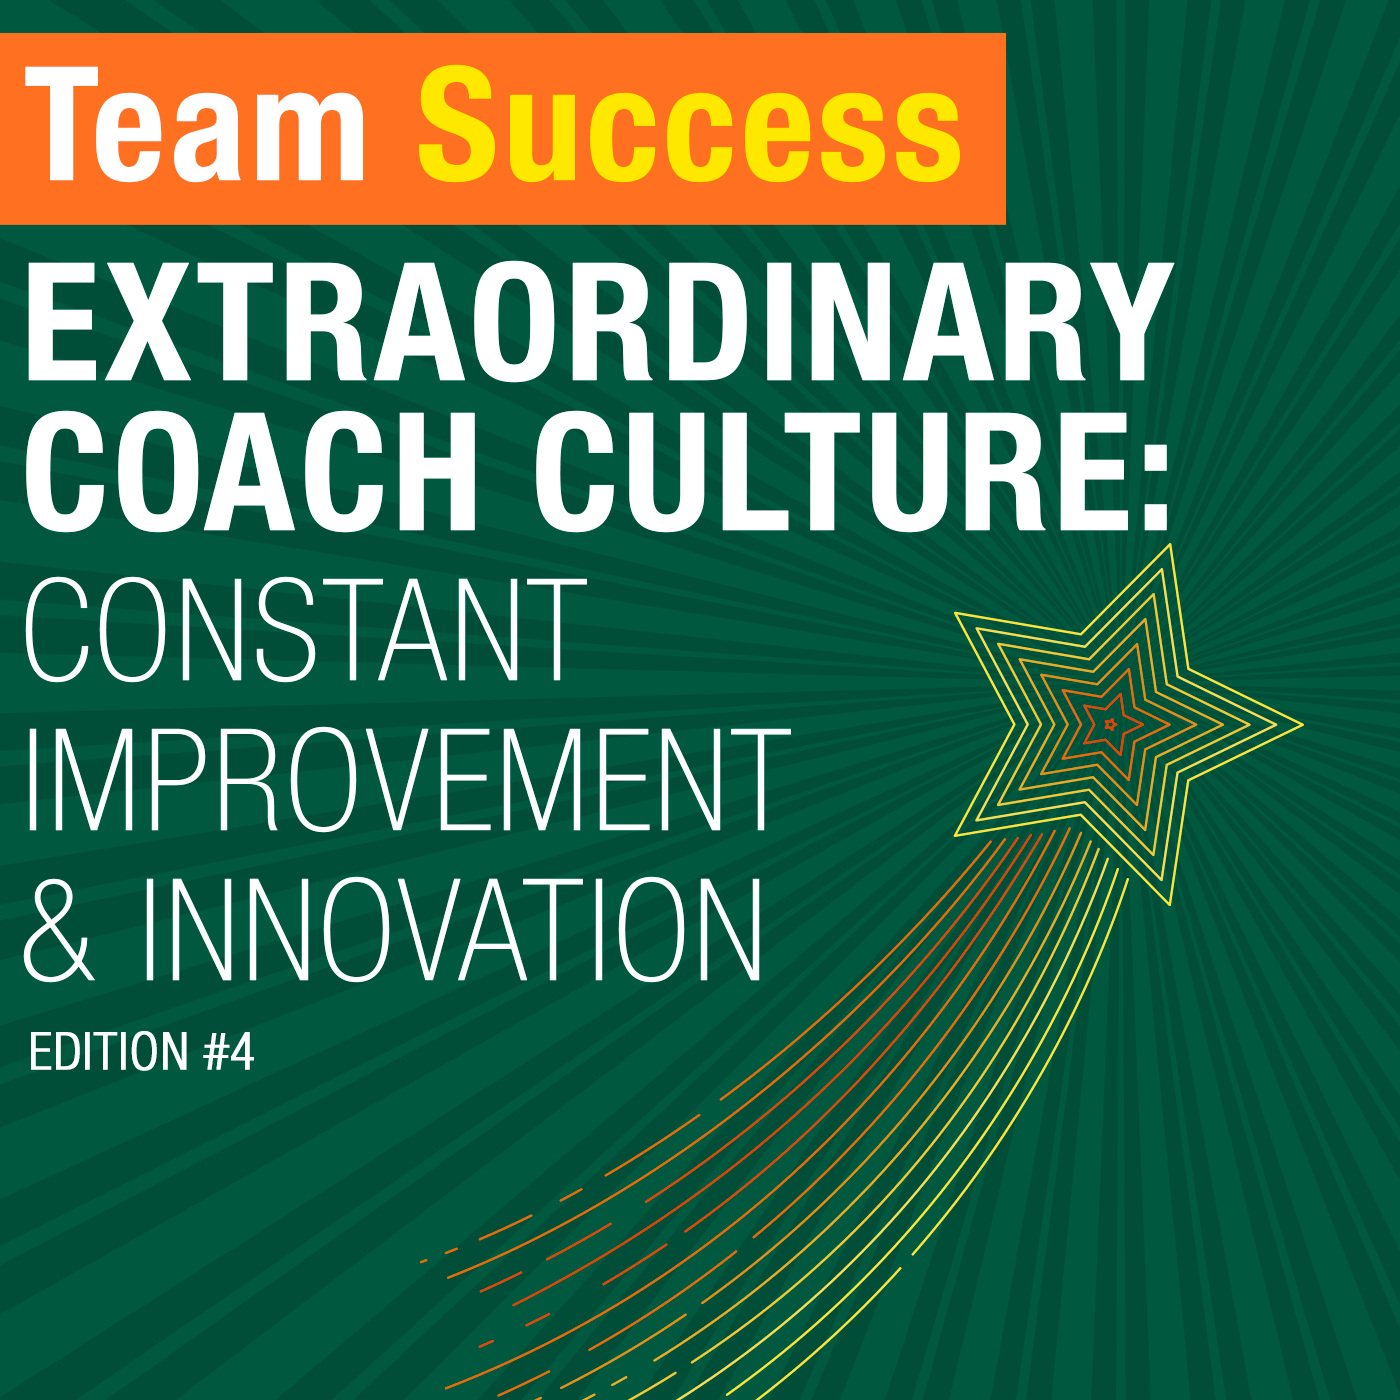 Extraordinary Coach Culture: Constant Improvement & Innovation